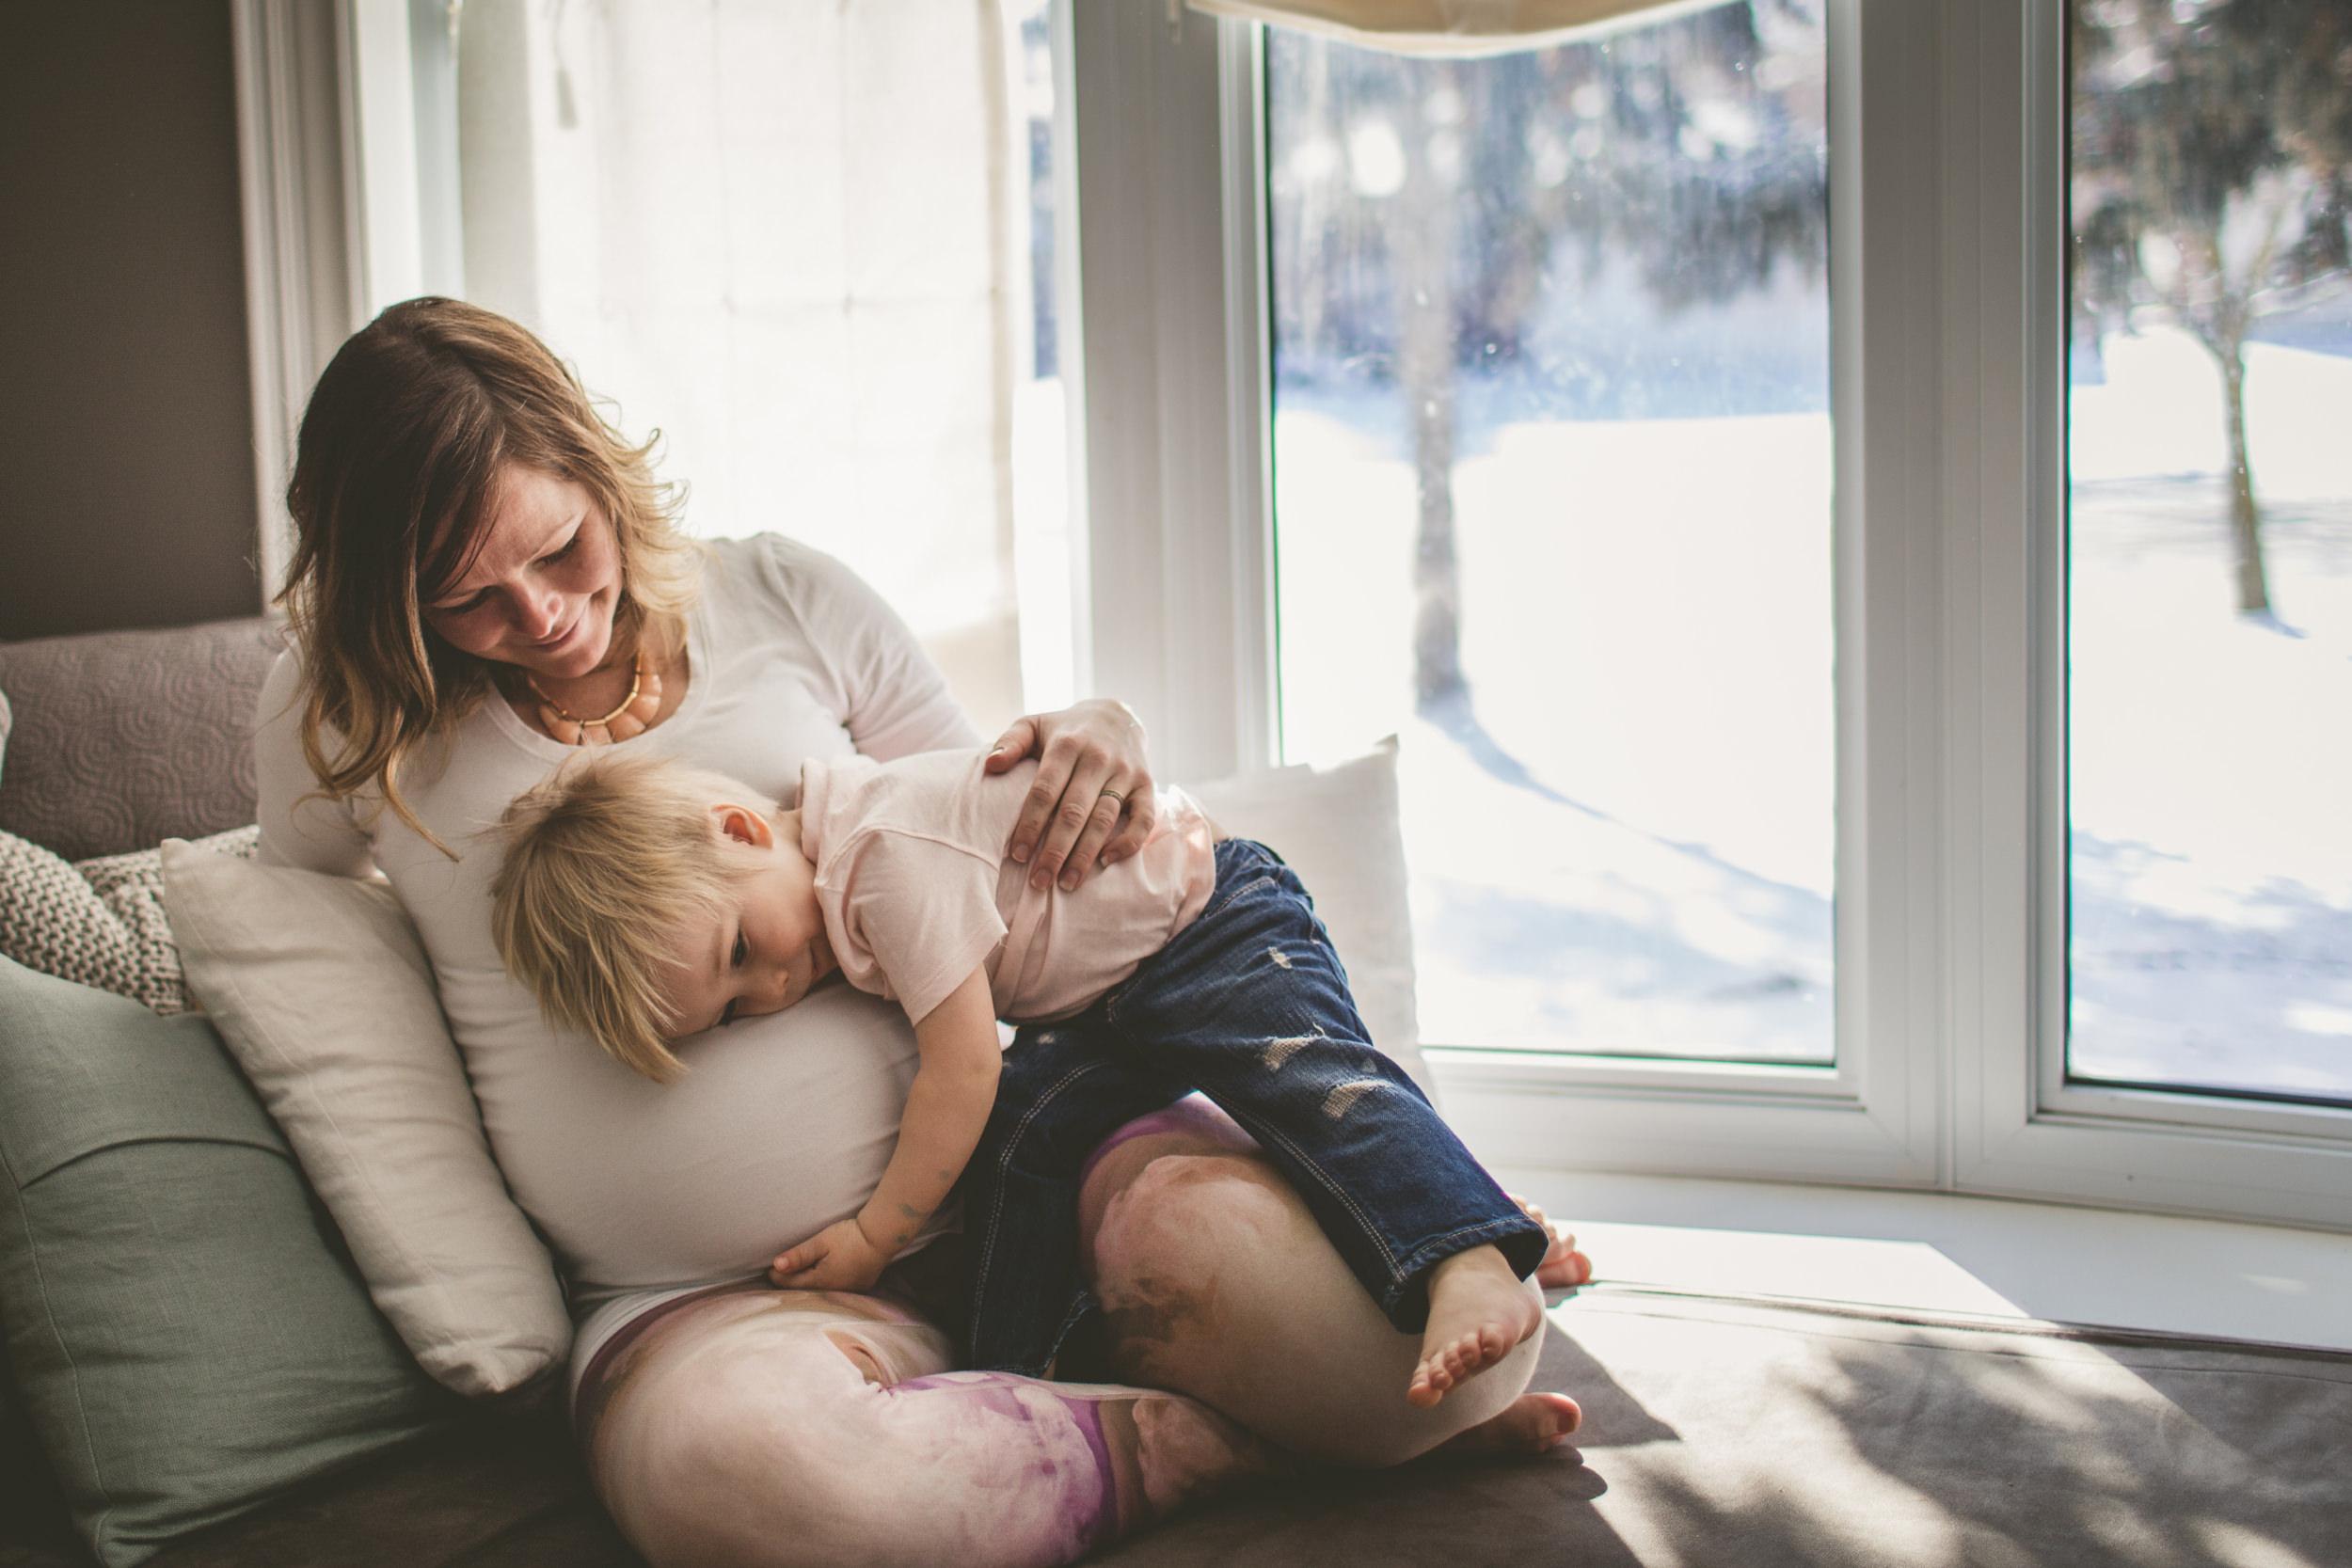 toronto lifestyle photographer, toronto newborn lifestyle photographer, toronto maternity lifestyle photography, toronto maternity photographers